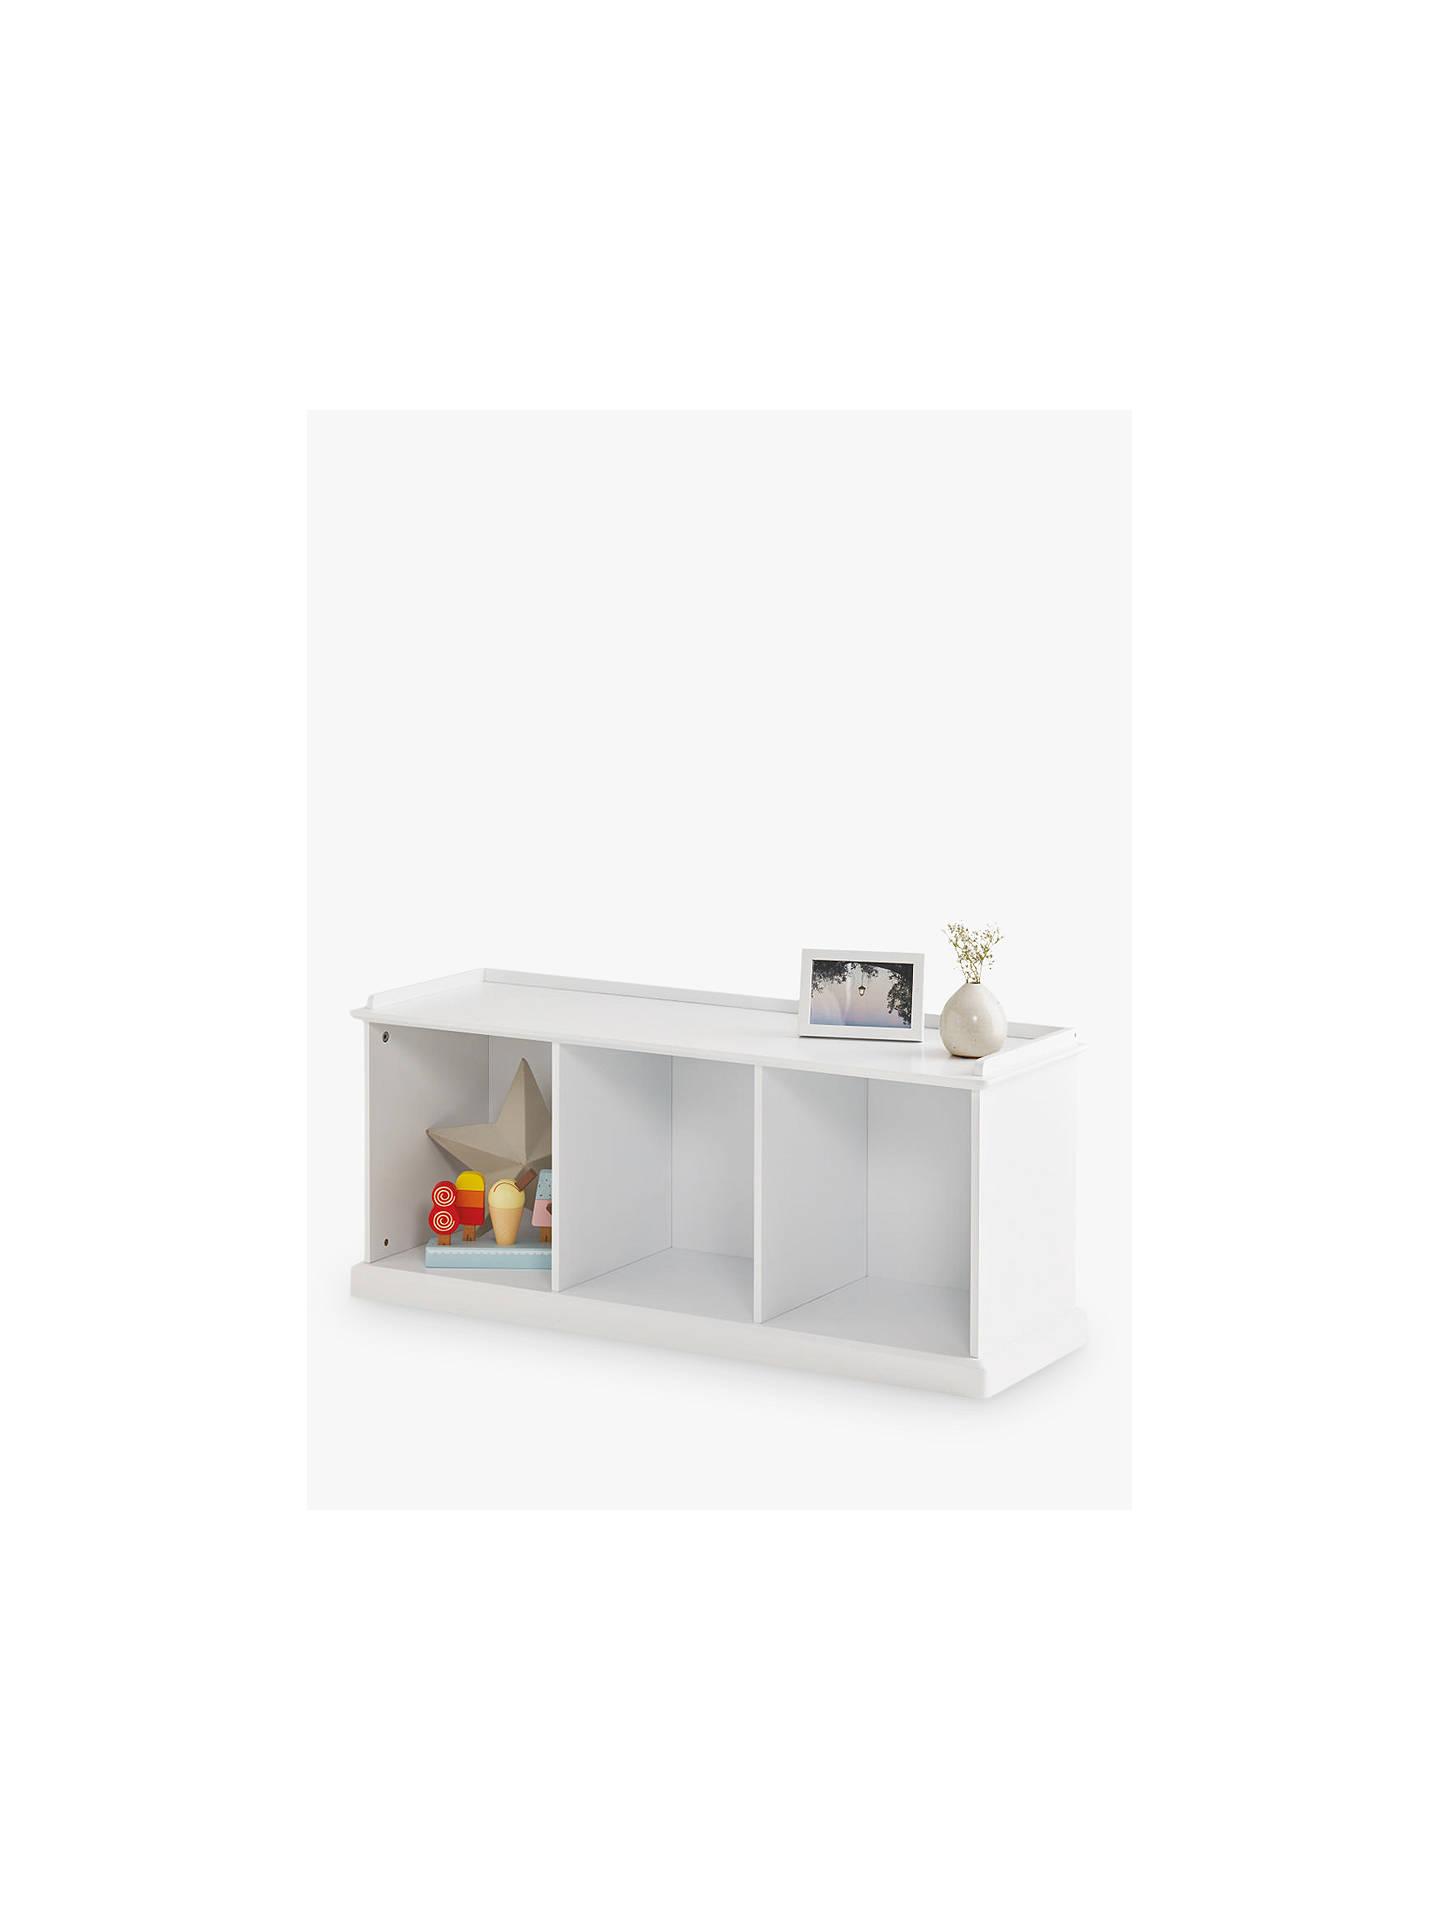 Awe Inspiring Great Little Trading Co Abbeville Storage Bench White Dailytribune Chair Design For Home Dailytribuneorg